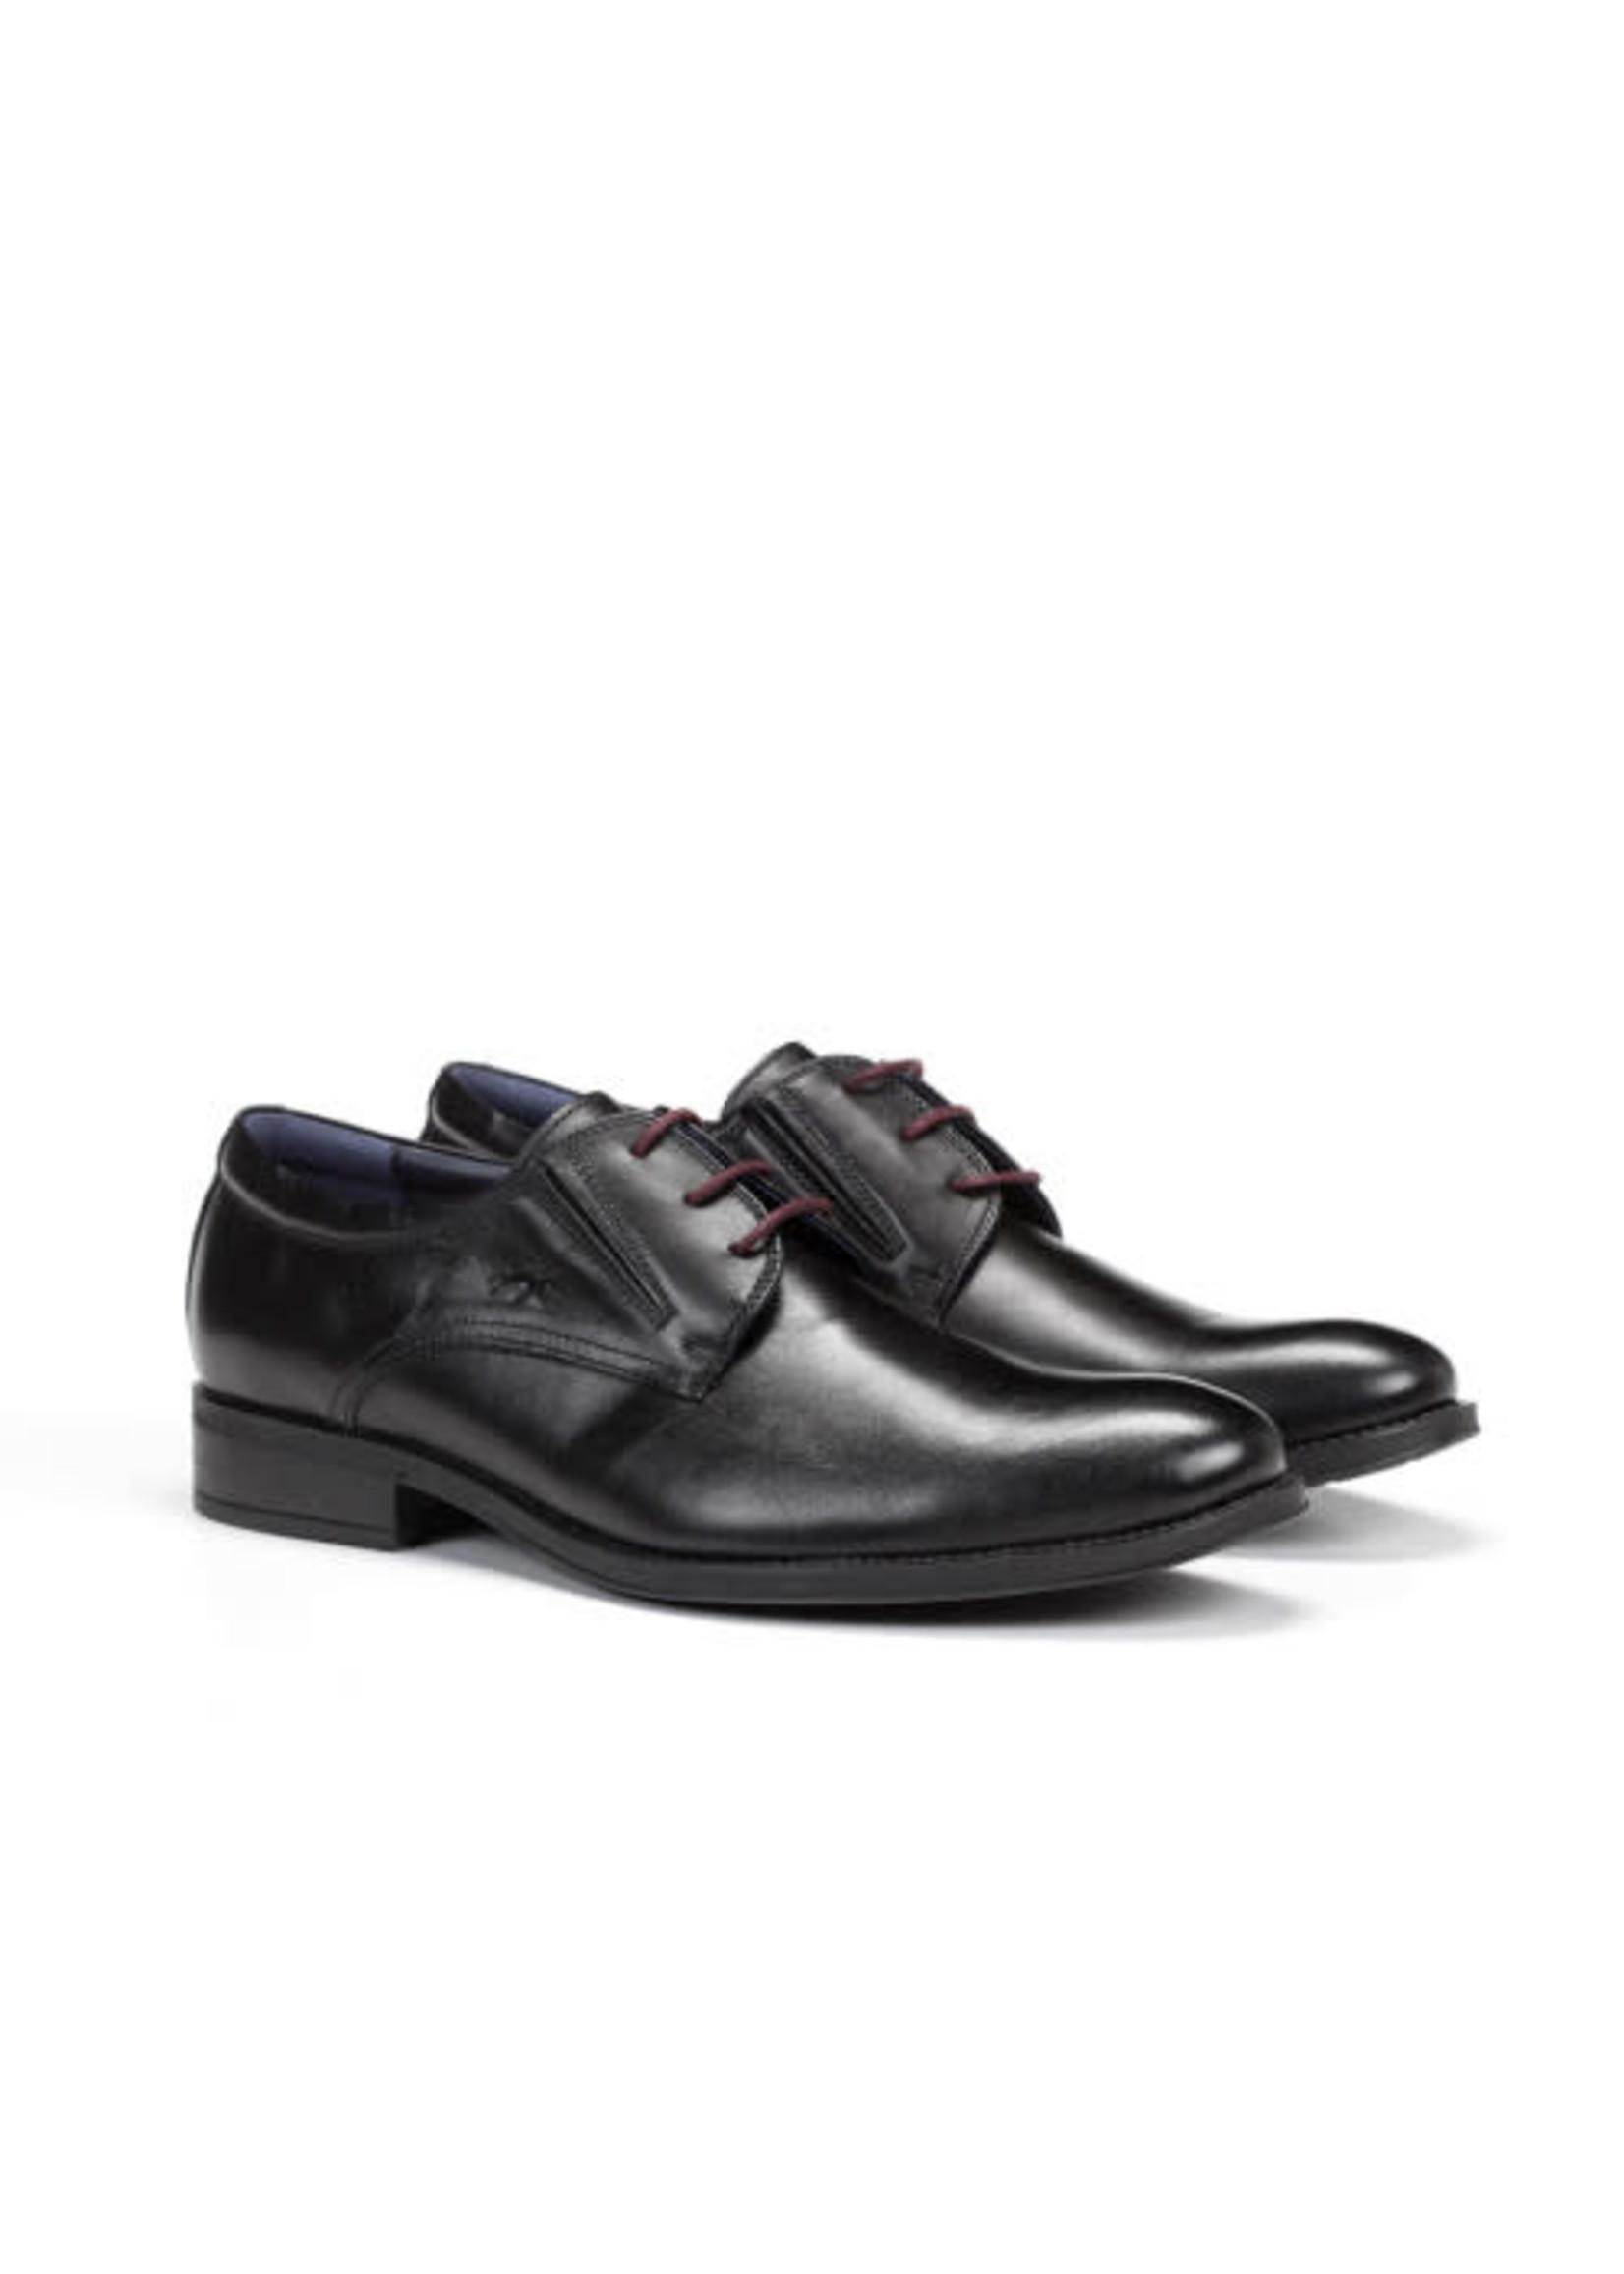 Fluchos Fluchos Heracles Shoe 8410